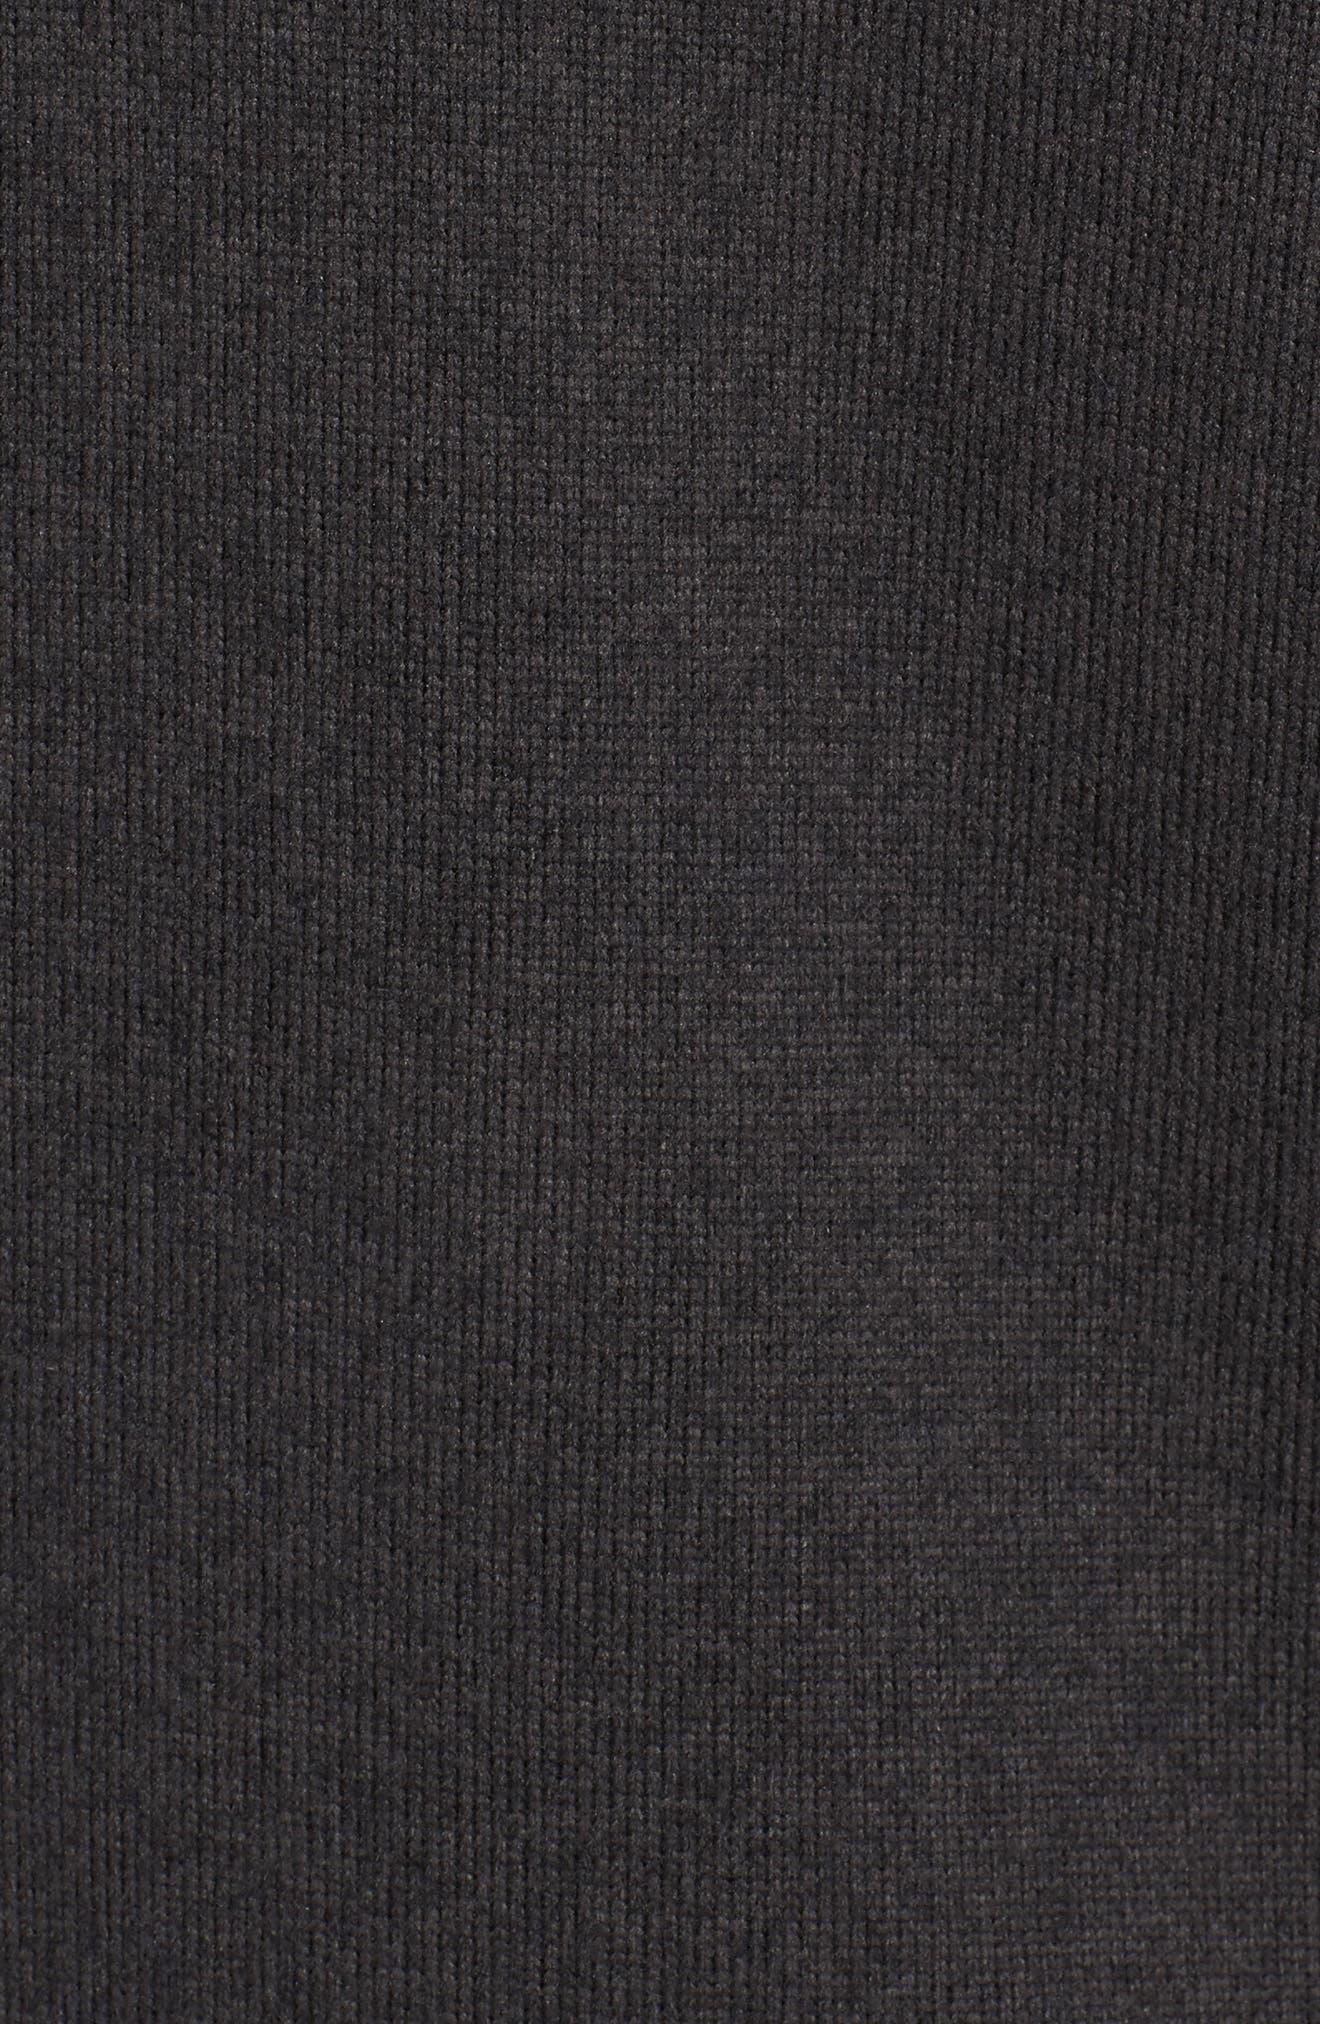 Gordon Lyons Quarter-Zip Fleece Jacket,                             Alternate thumbnail 6, color,                             BLACK HEATHER